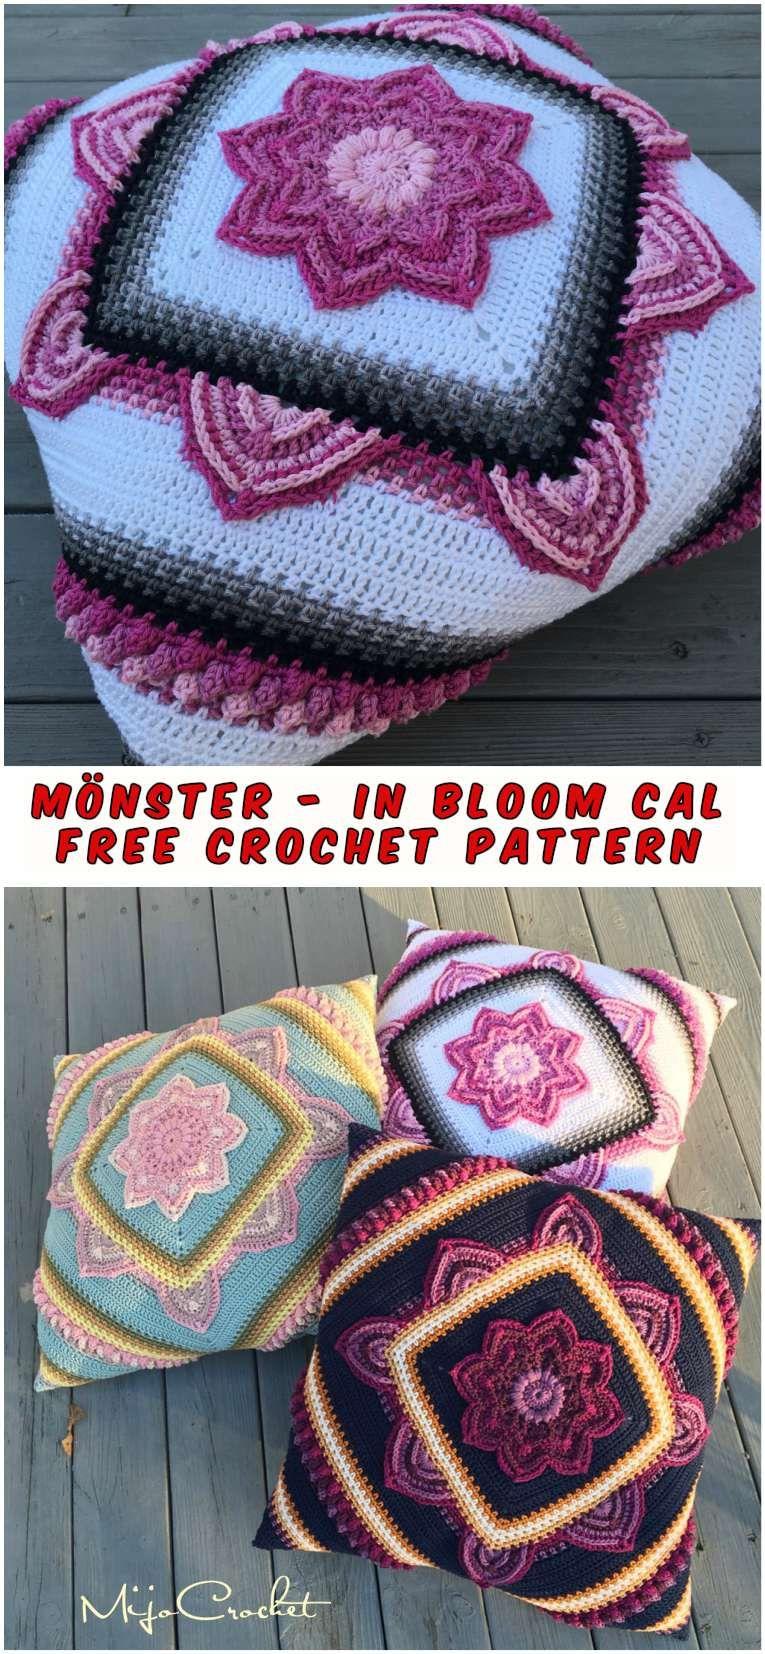 Mönster - In Bloom CAL – Free Crochet Pattern